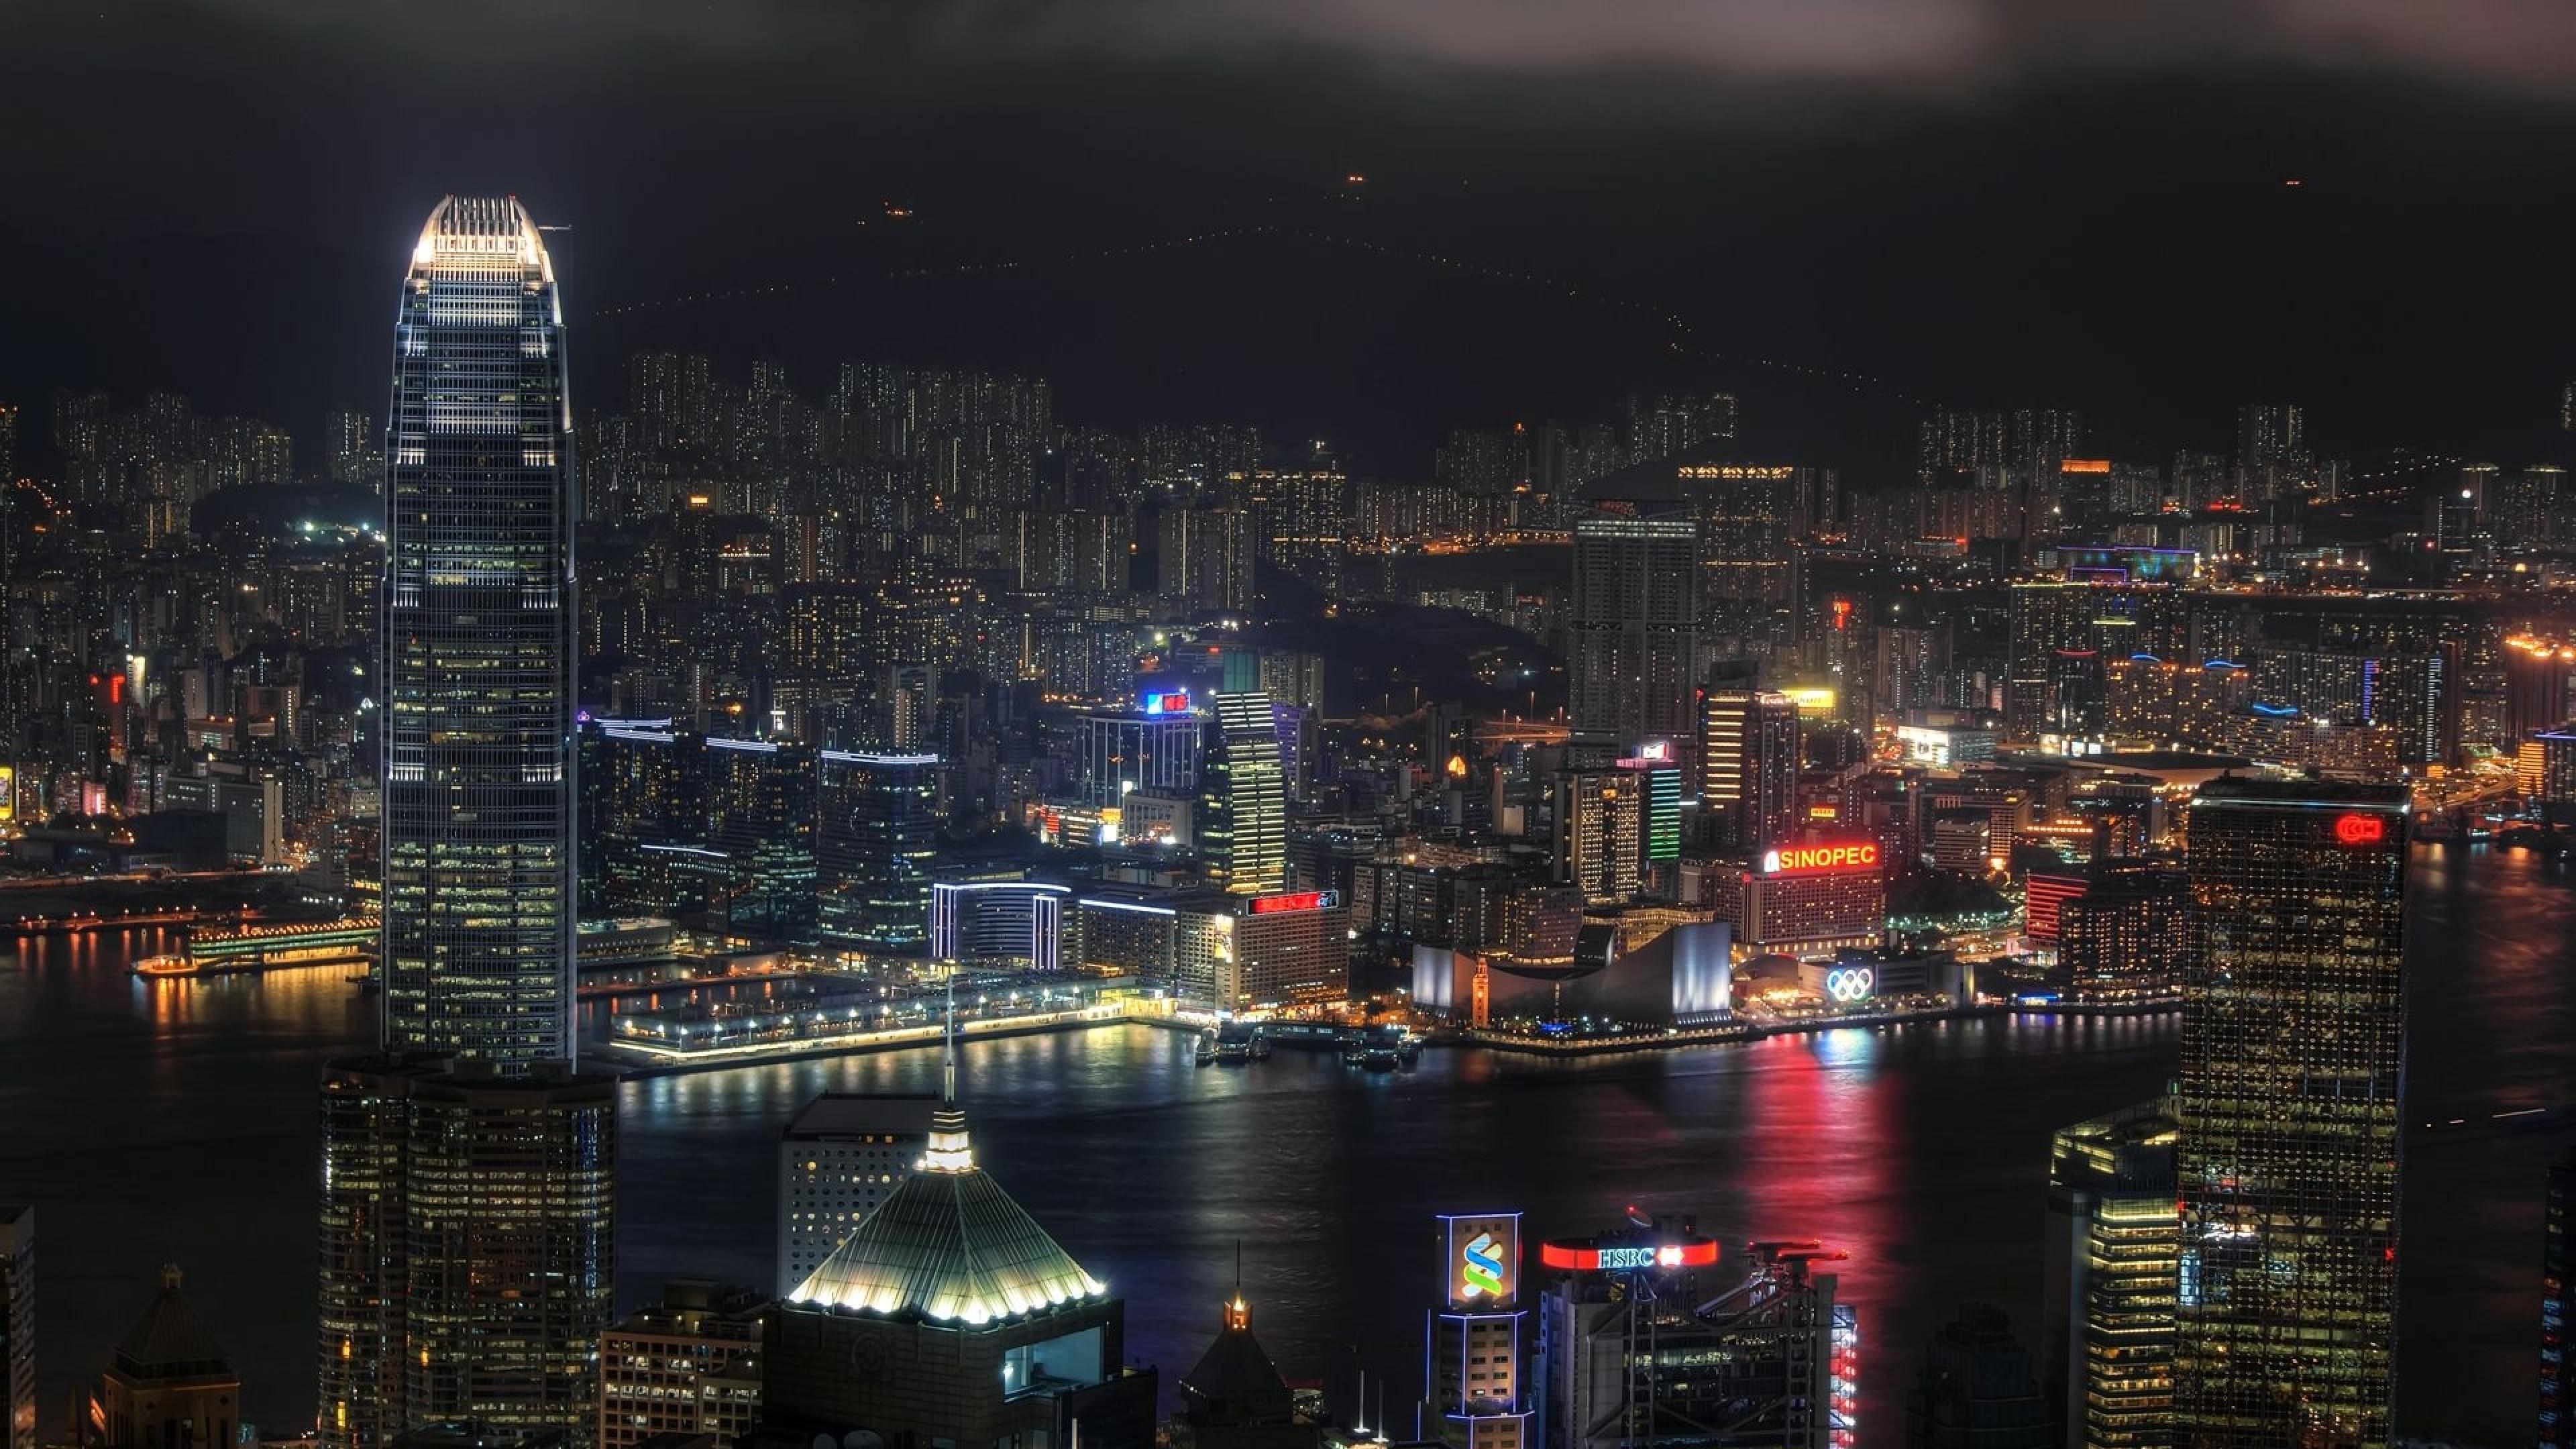 4K City Wallpaper (23+ Images